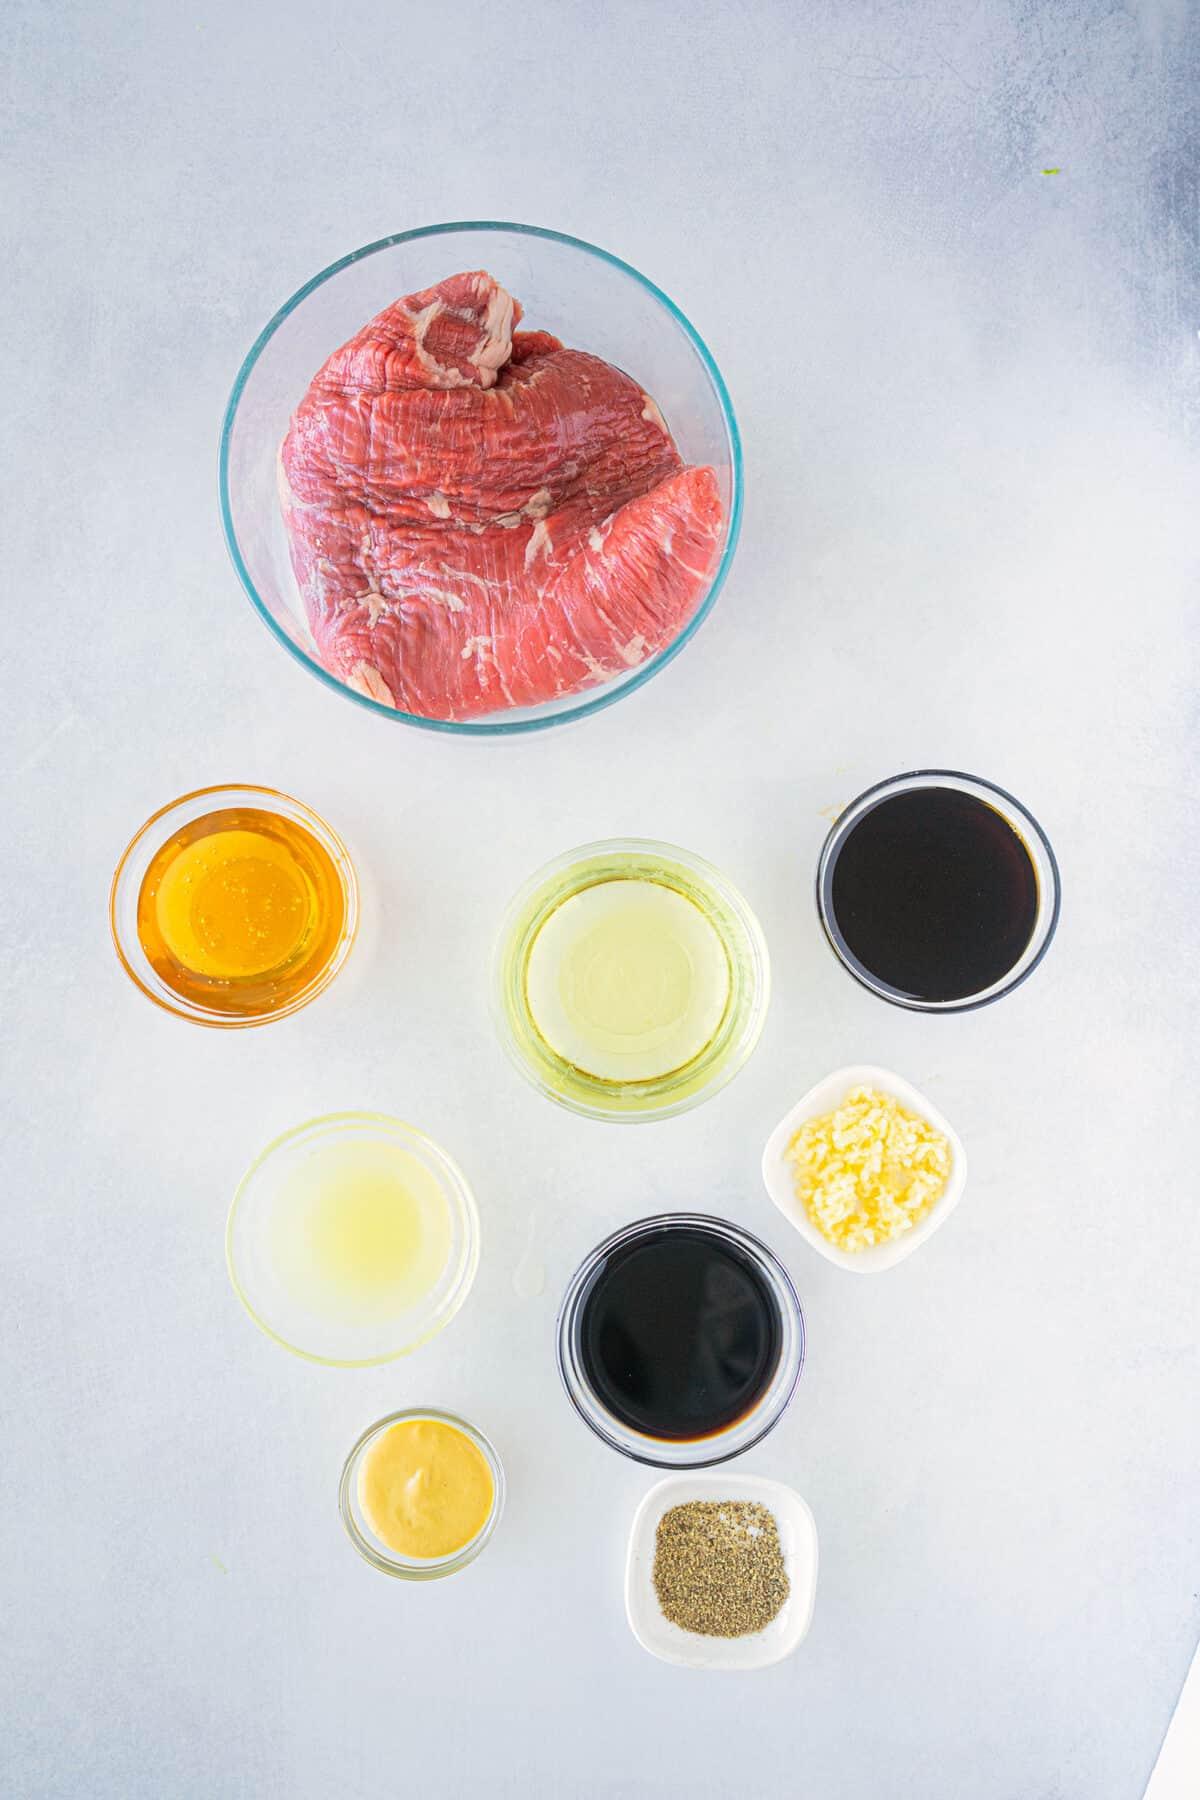 ingredients for flank steak marinade